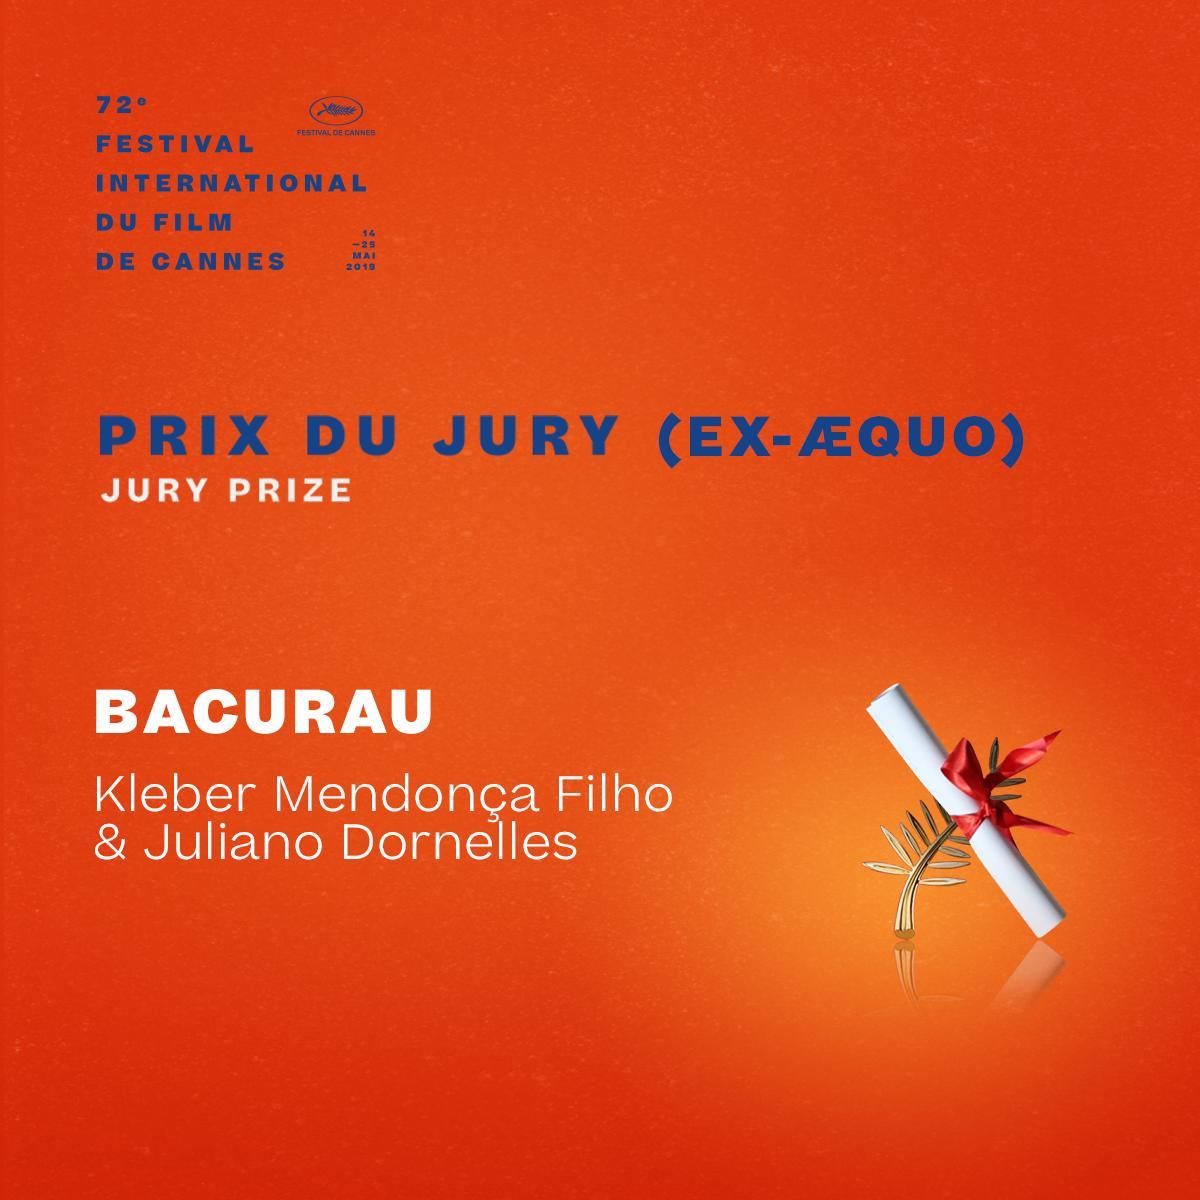 And the Jury Prize winner ex-æquo is… #Bacurau by Kleber Mendonça Filho & Juliano Dornelles  #Cannes2019 #Awards https://t.co/RPpcBXKyfj